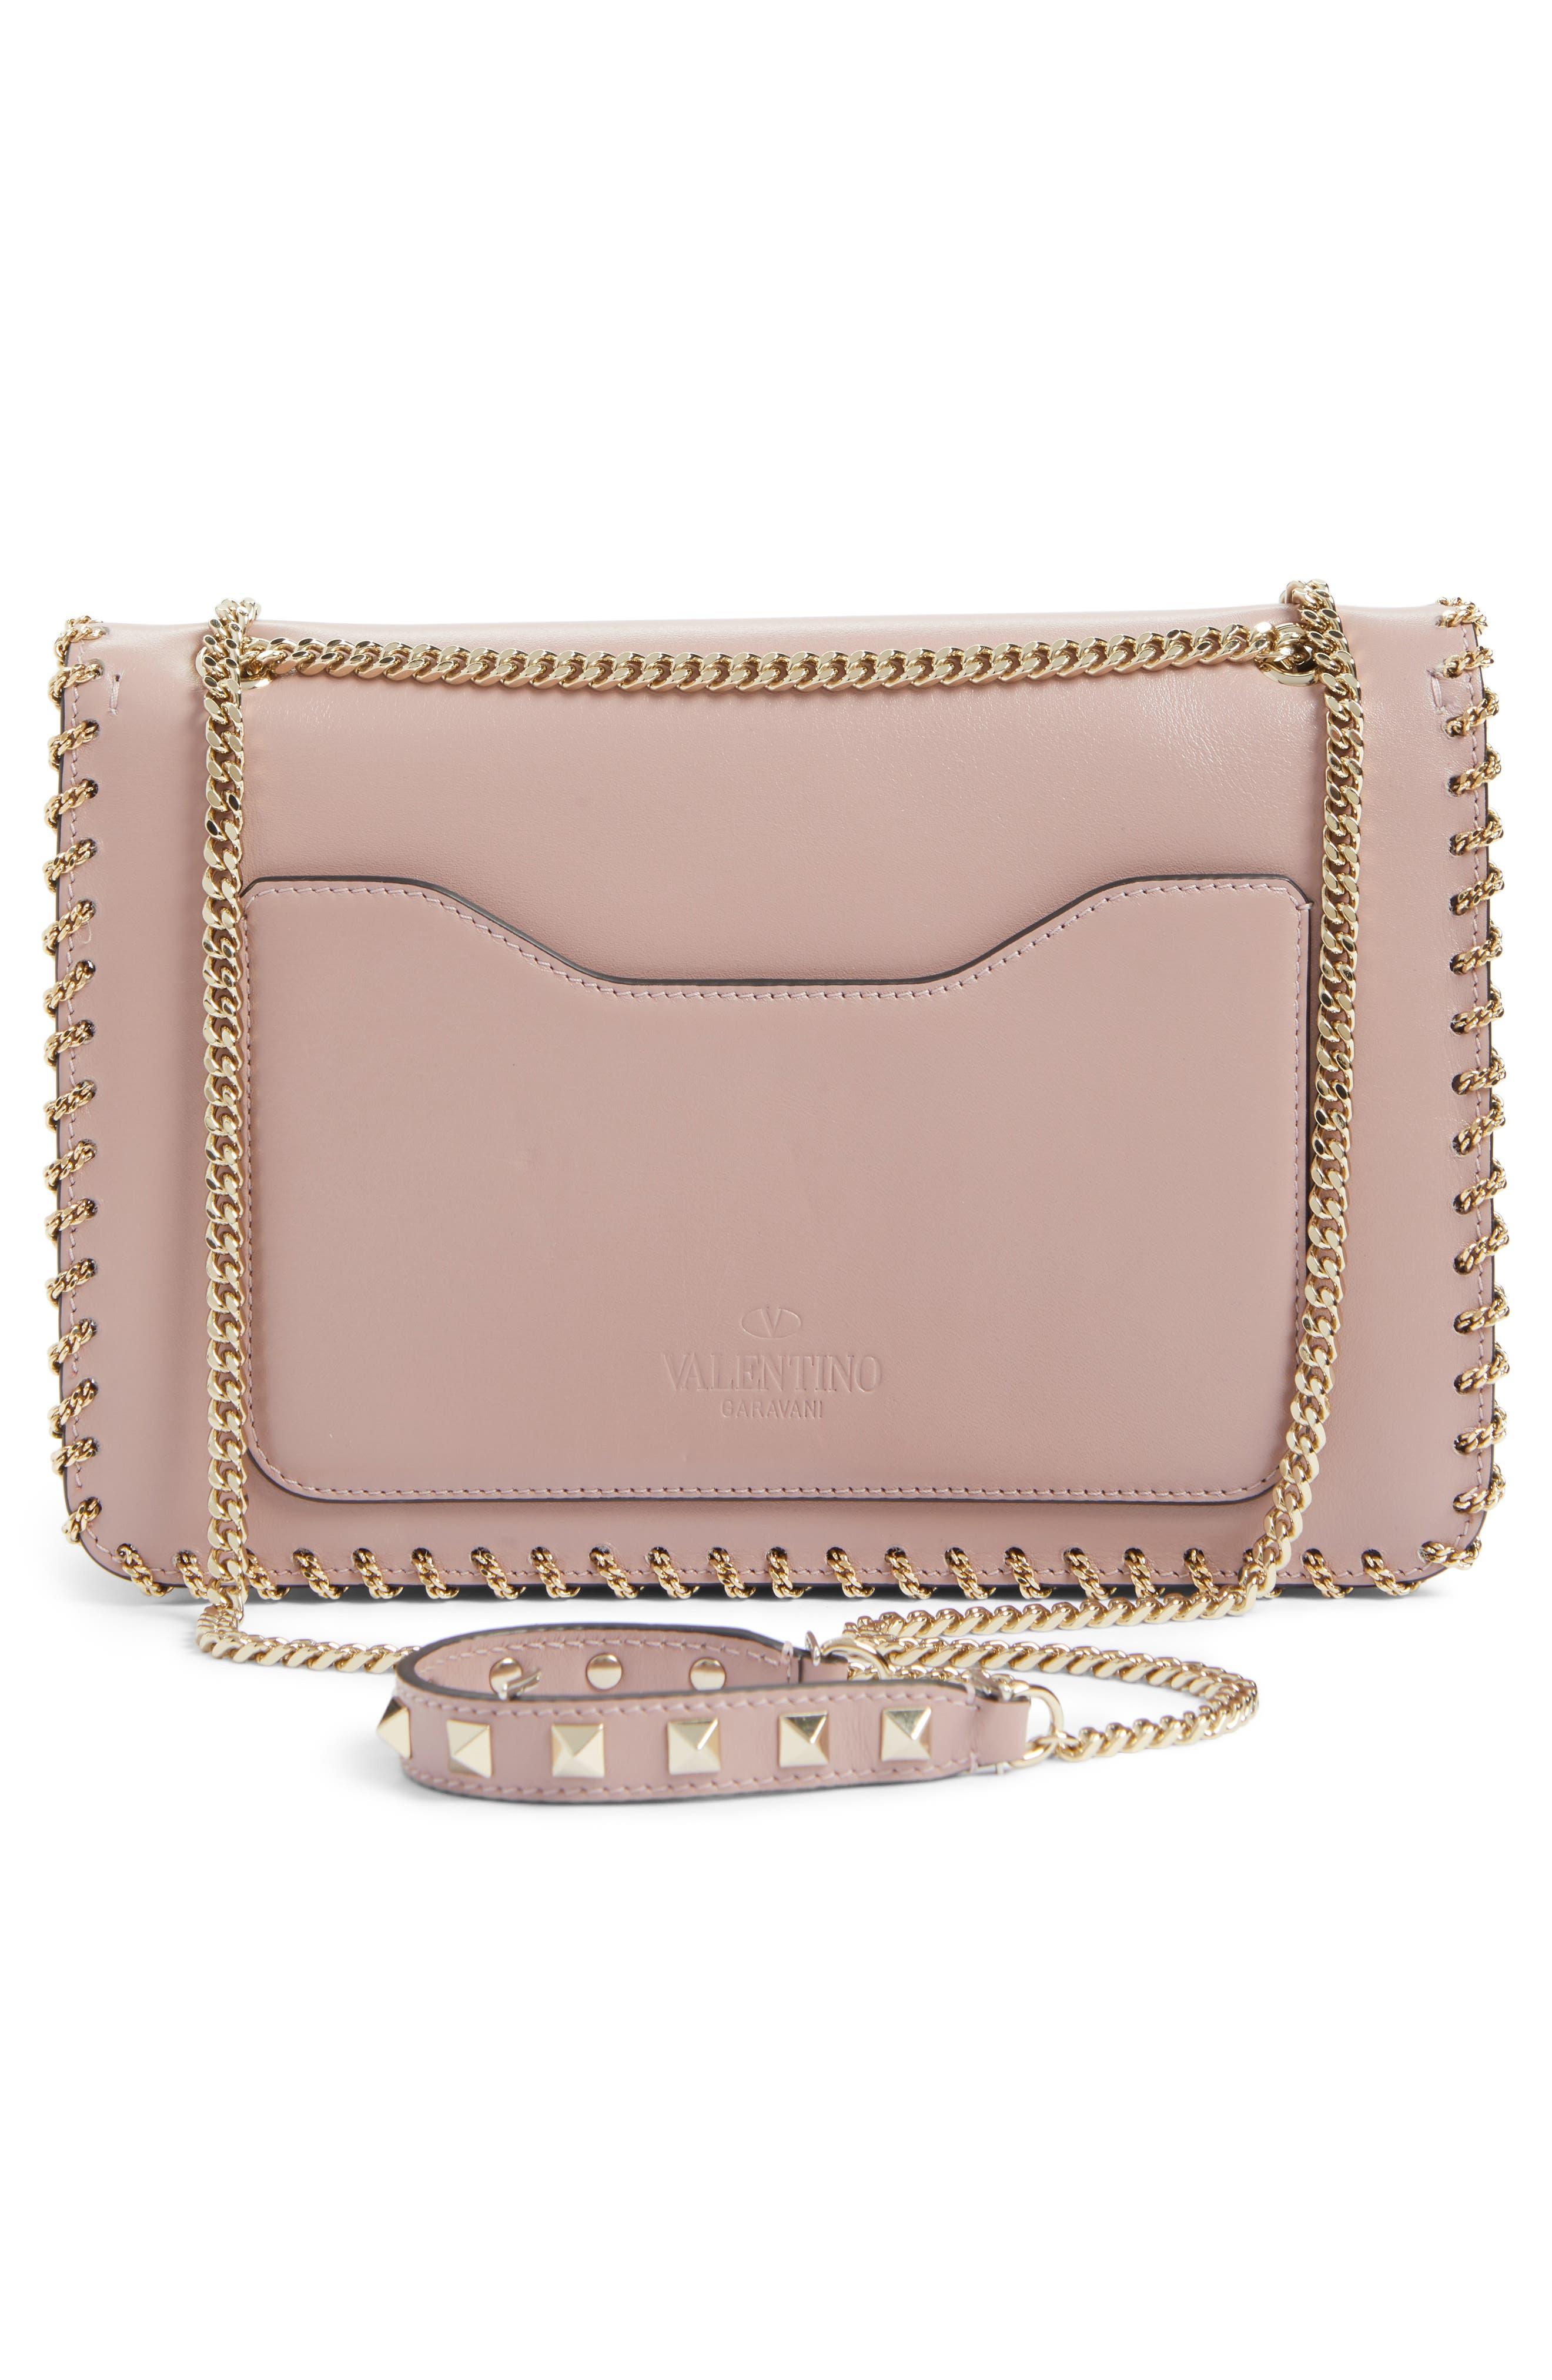 Demilune Whipstitch Leather Shoulder Bag,                             Alternate thumbnail 3, color,                             Lipstick